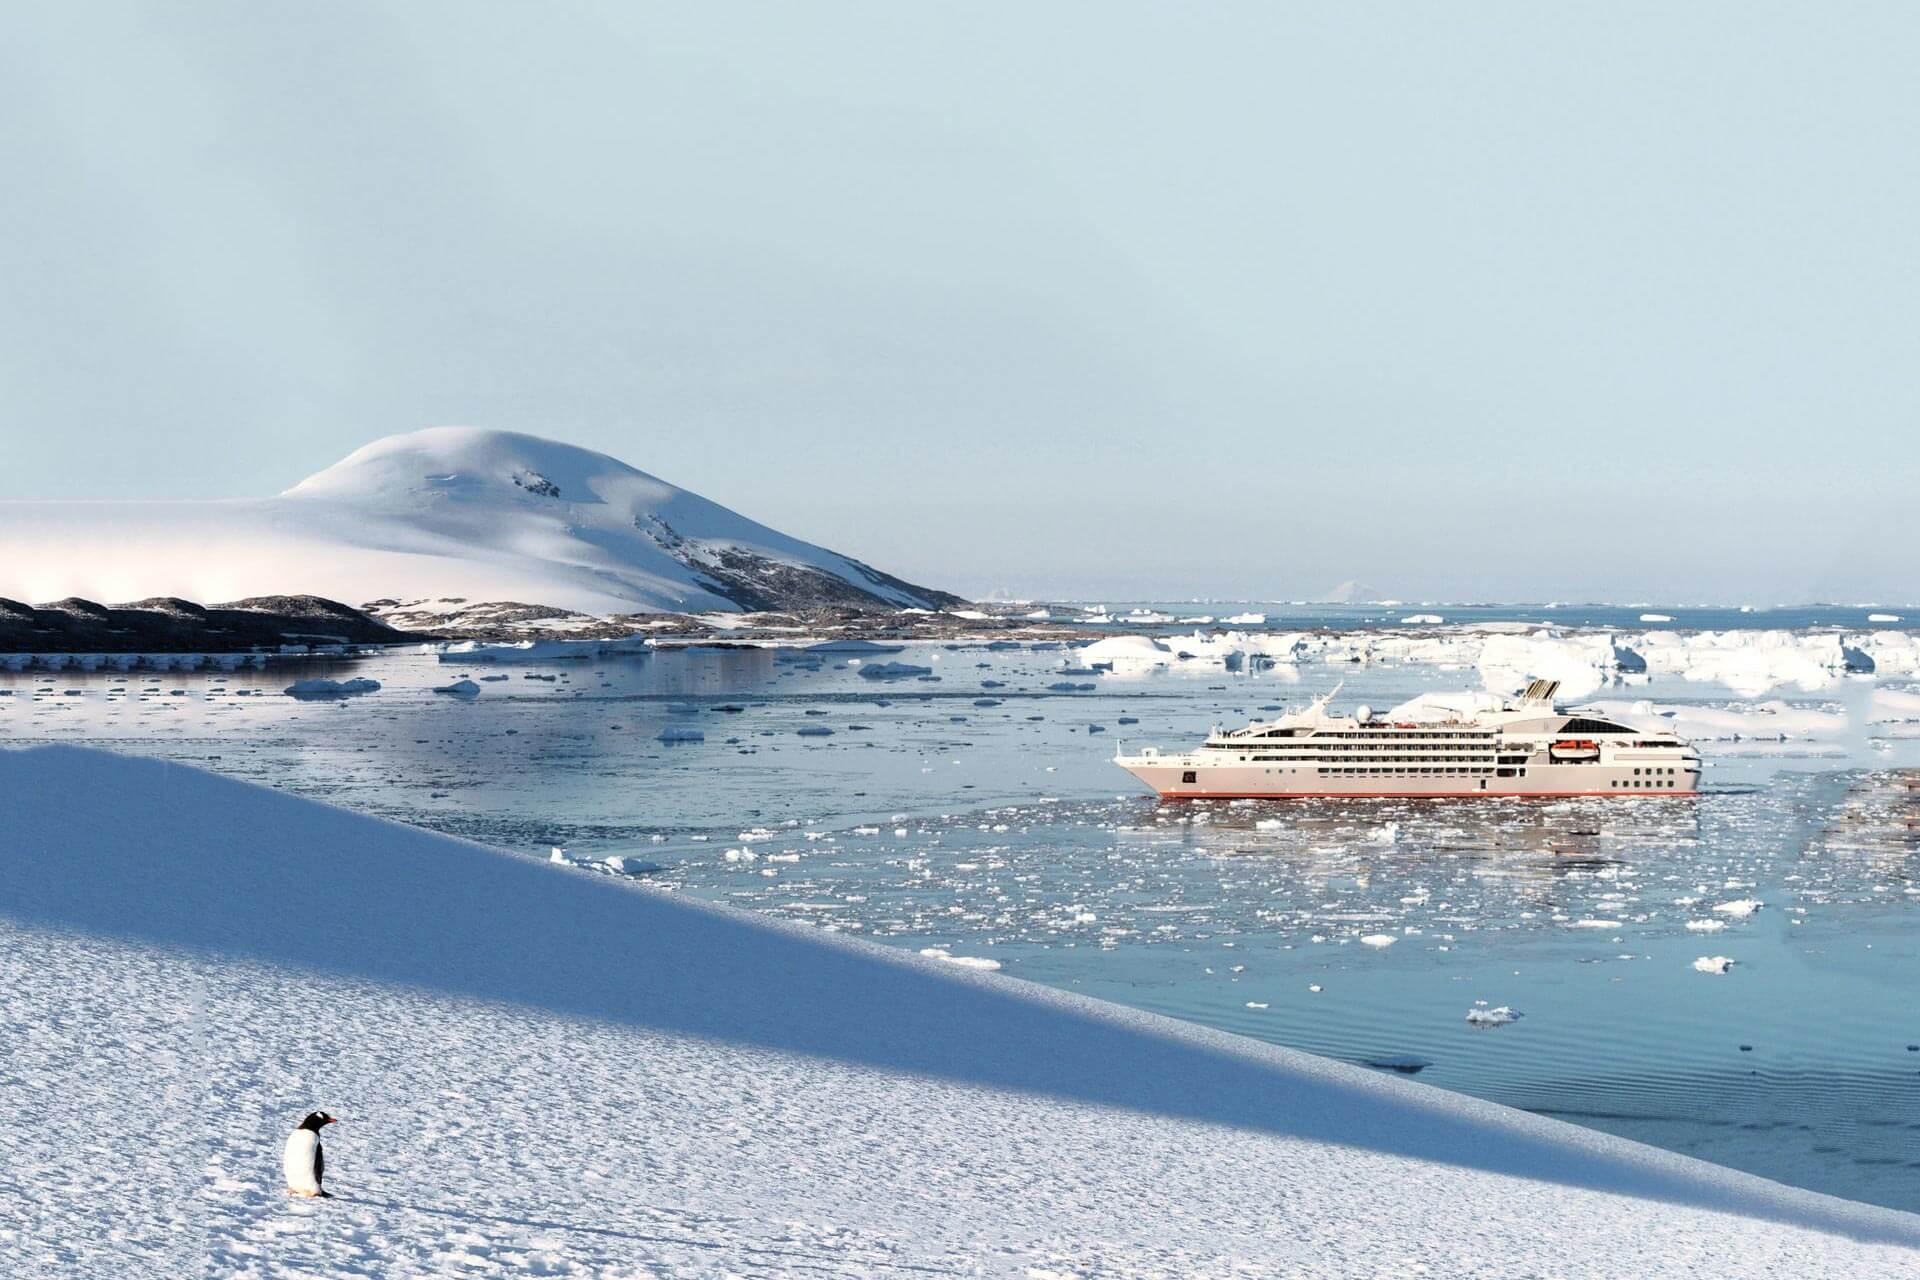 LE SOLEAL Antarktis